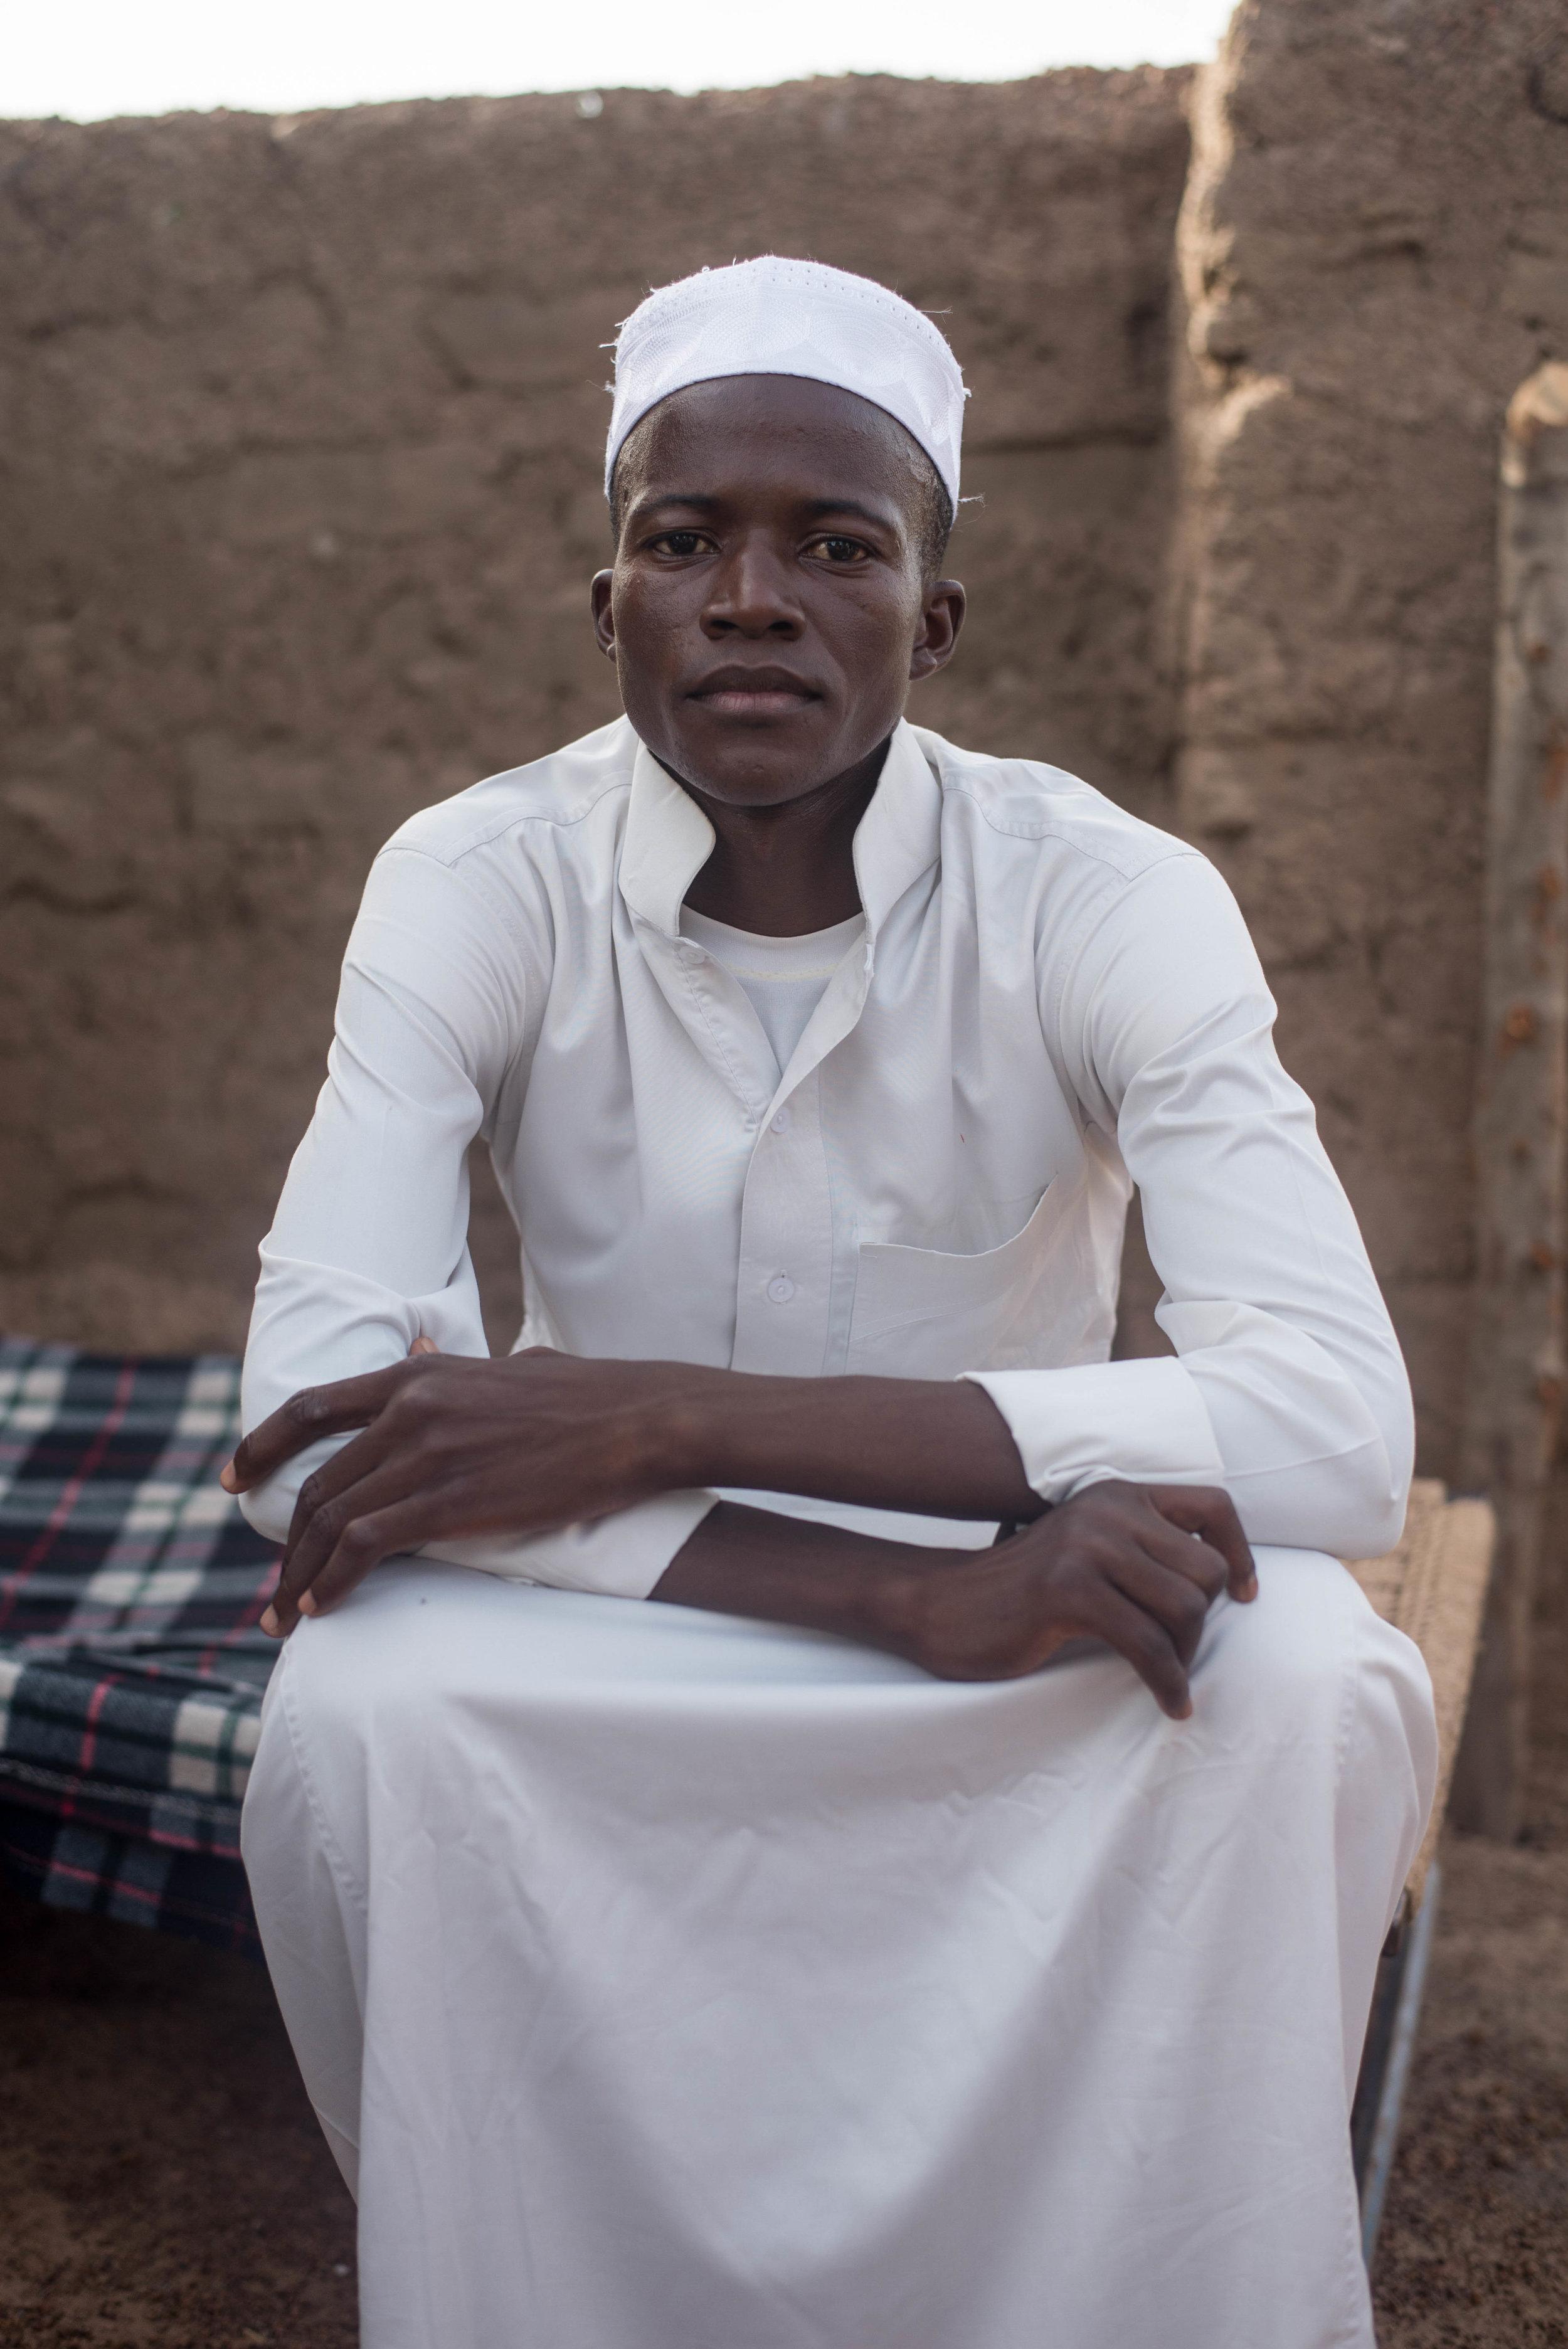 Harouna, Burkina Faso, 2016